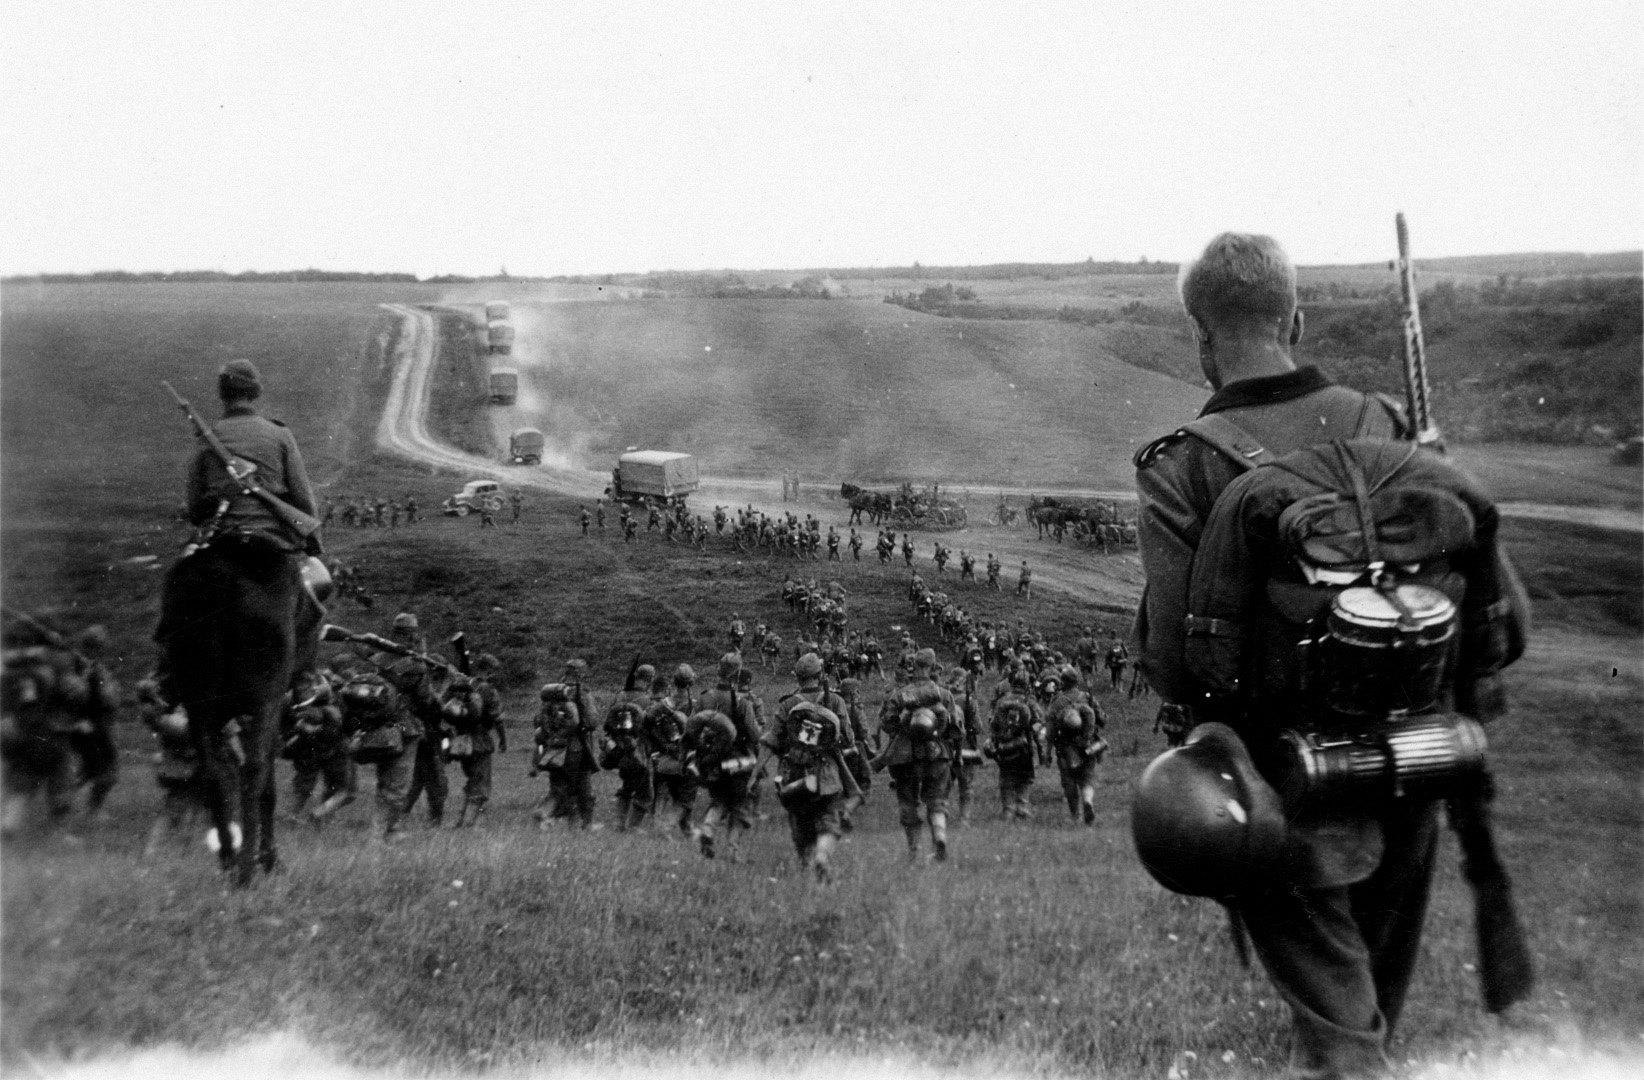 Diverses photos de la WWII - Page 30 21415010